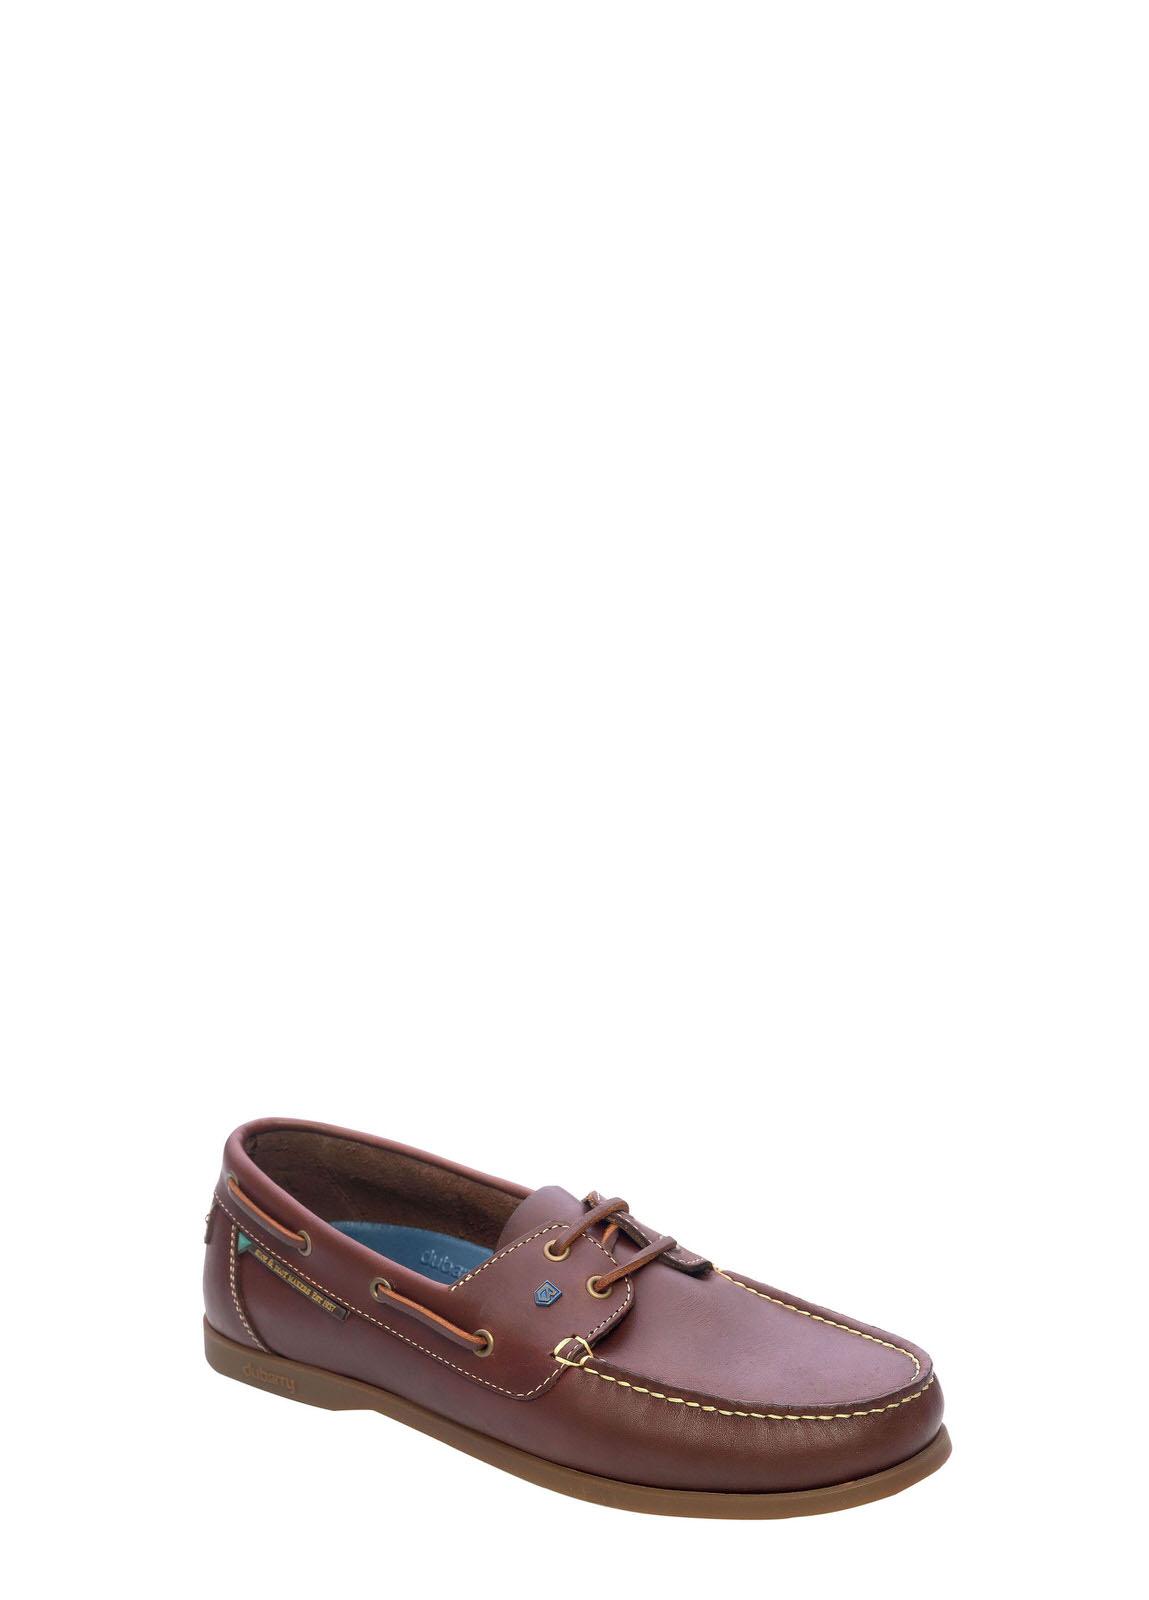 Dubarry_ Windward Mens Deck Shoe - Chestnut_Image_1